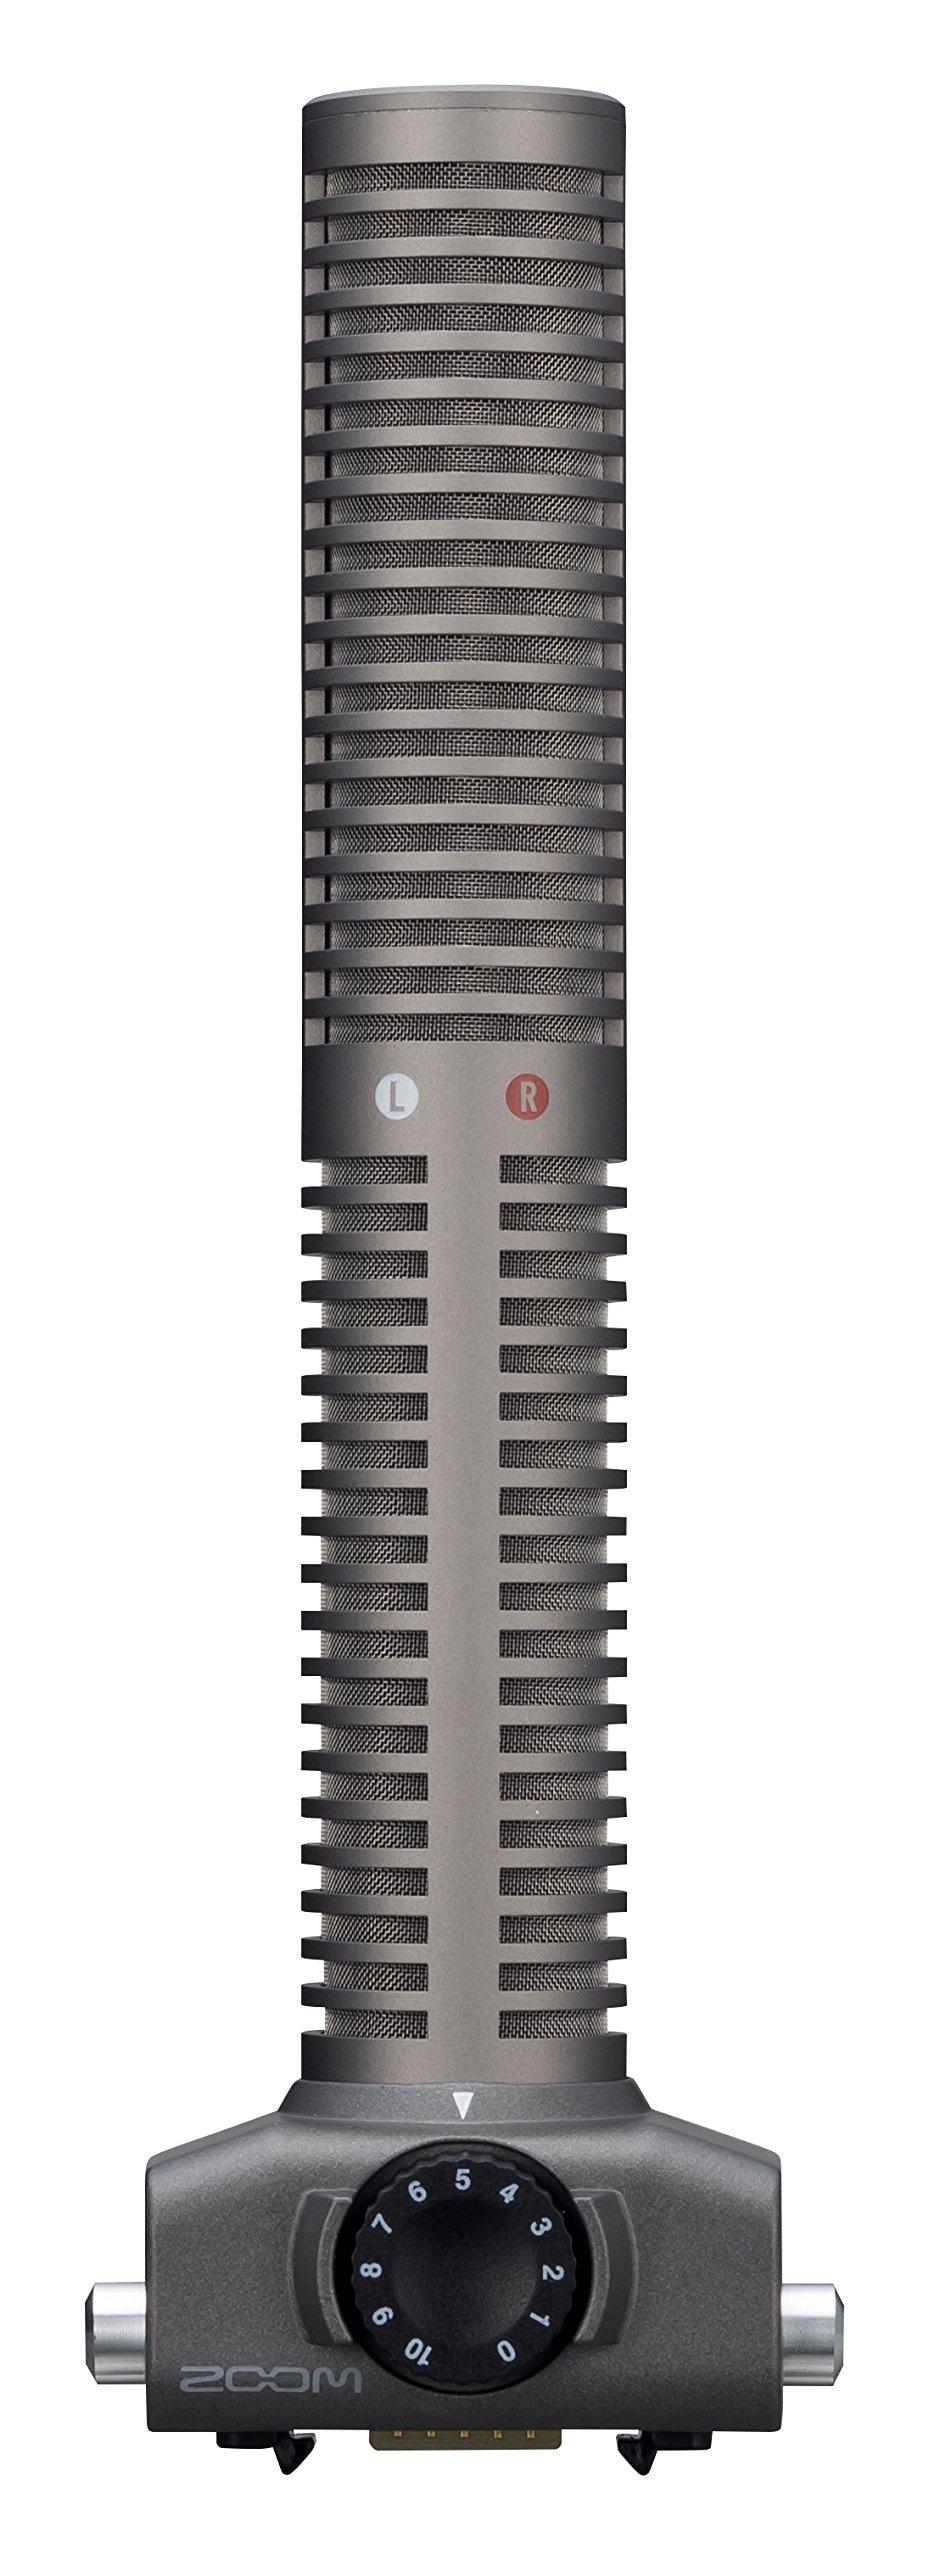 Zoom SSH-6 Stereo Shotgun Microphone Capsule by Zoom (Image #1)